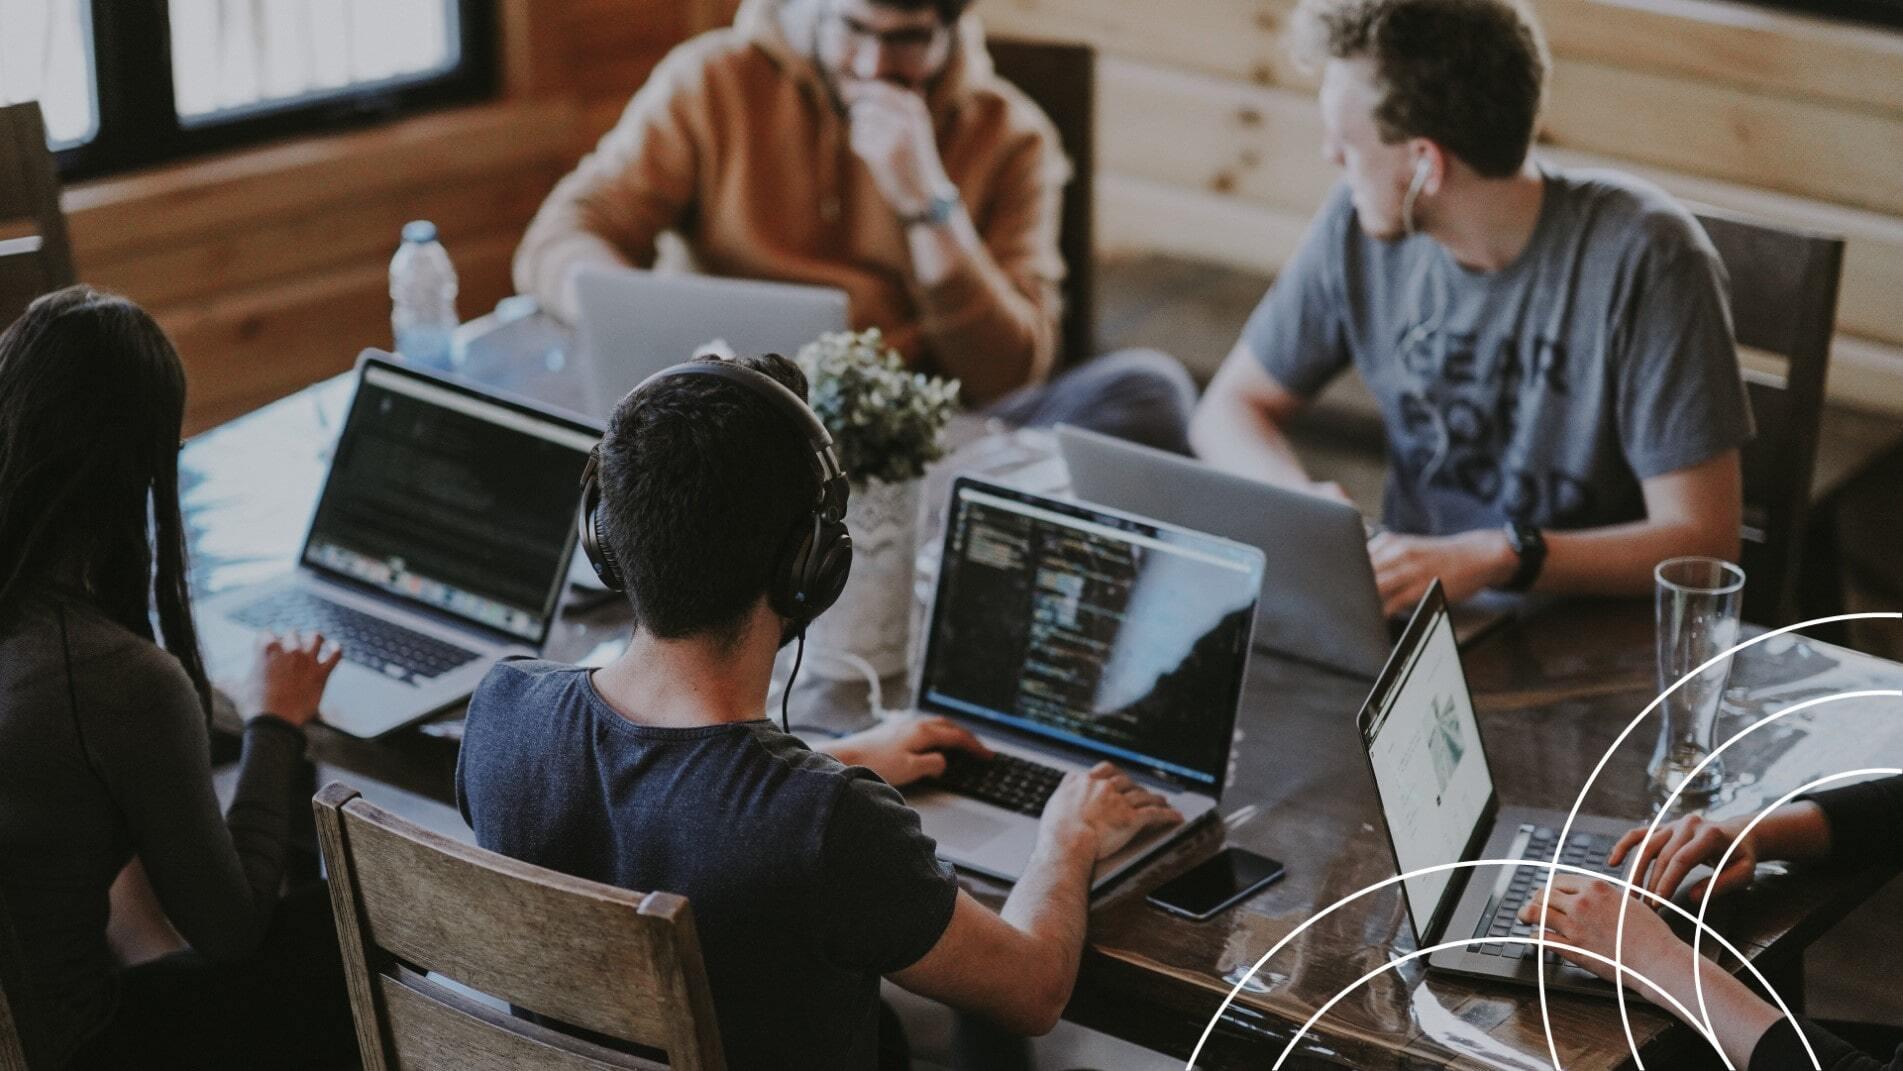 The 3 Types of Online Communities